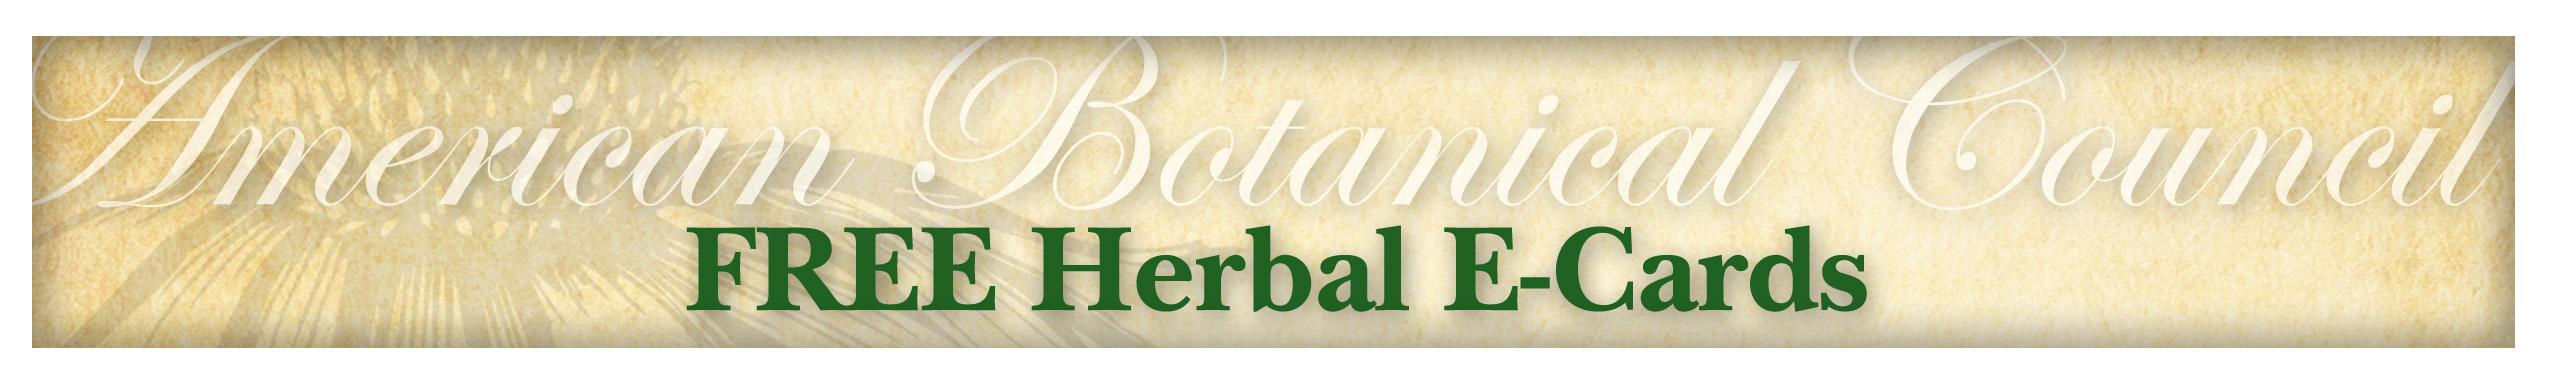 Ecard page american botanical council kristyandbryce Gallery